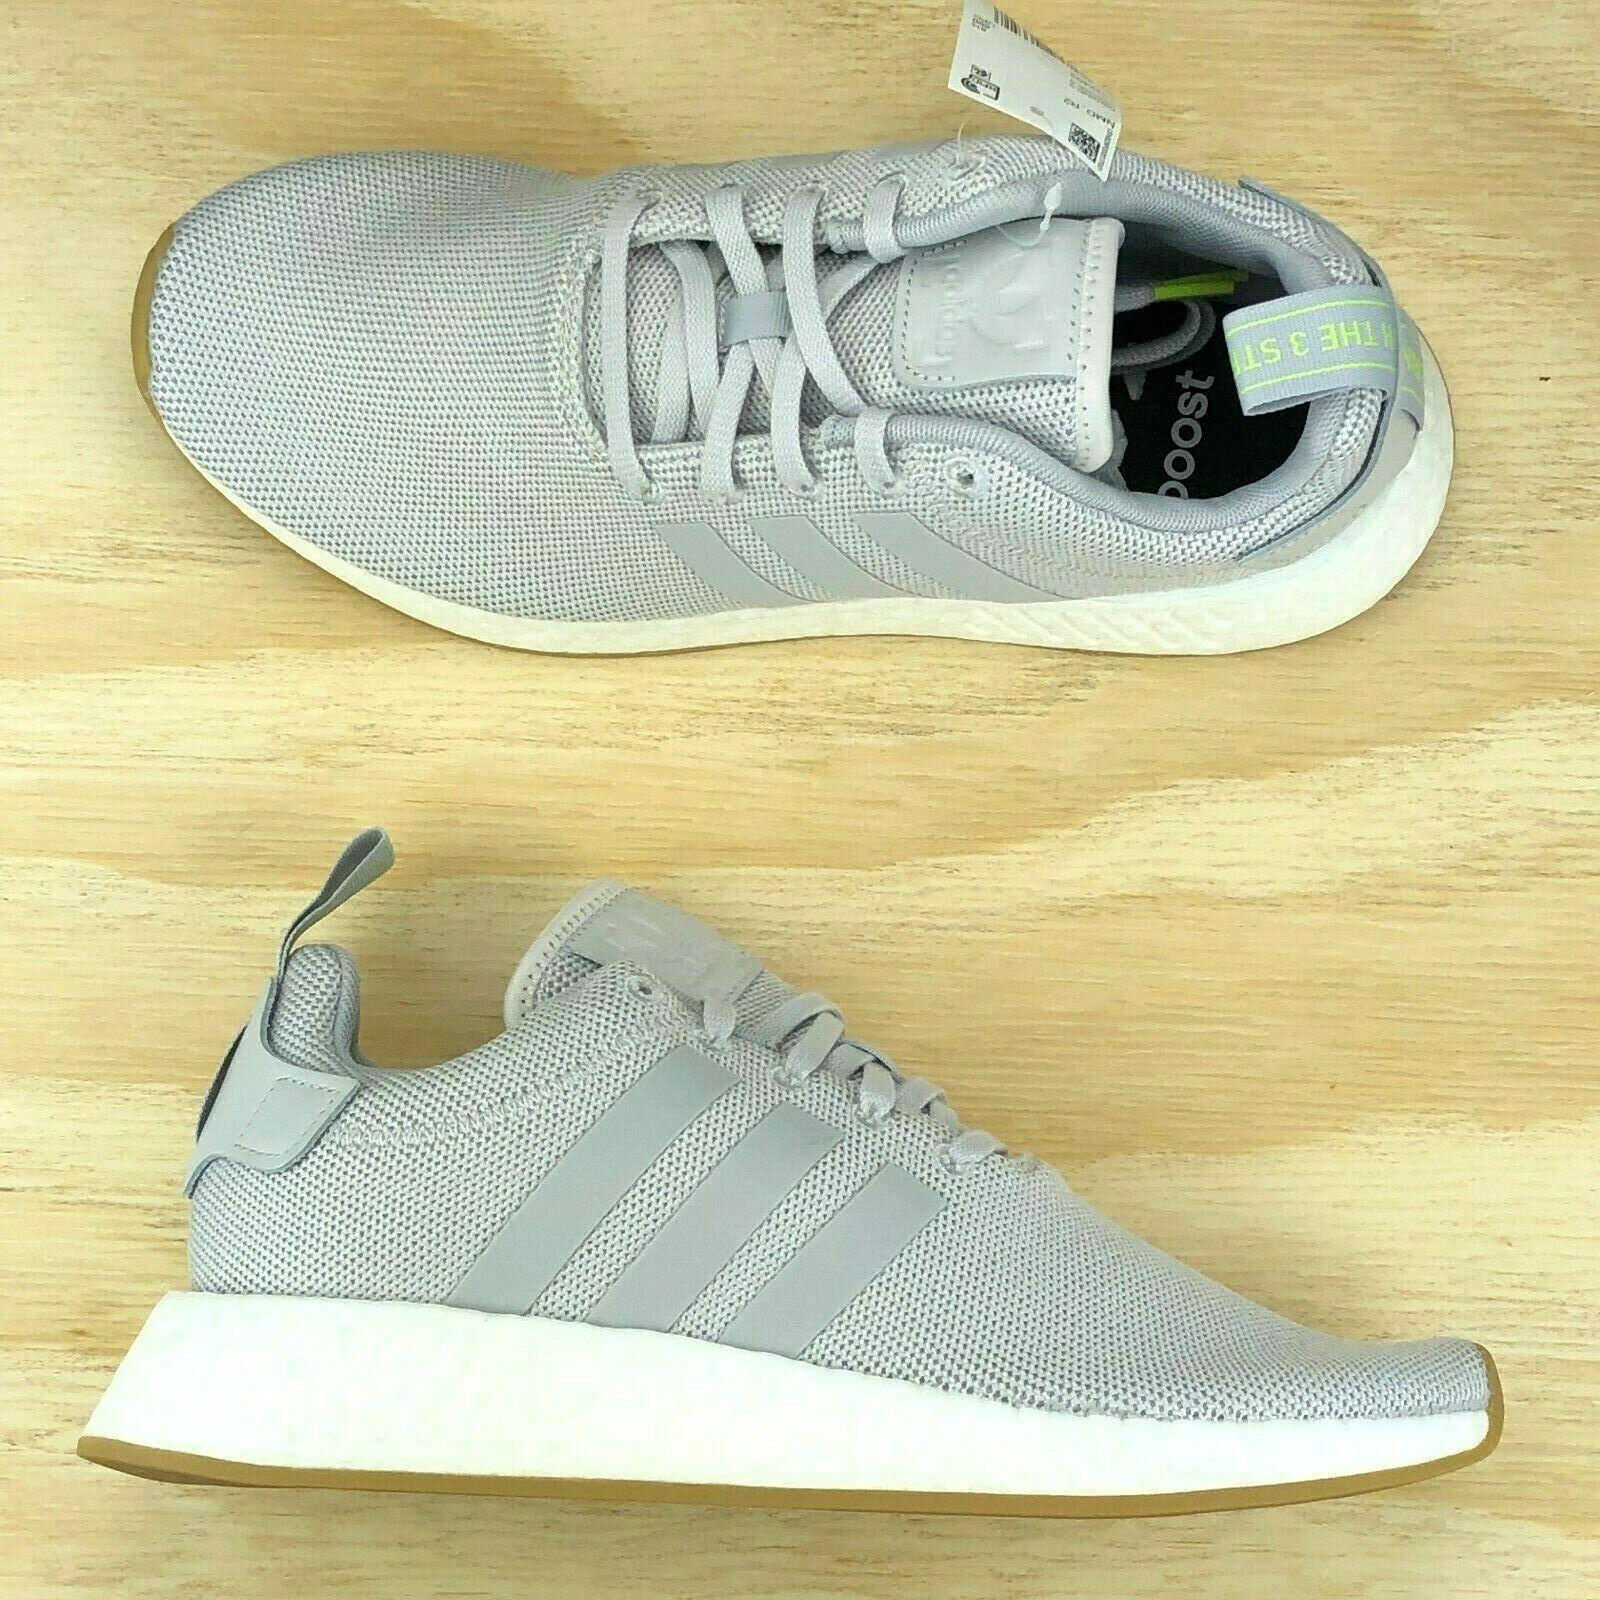 Adidas Originals Nmd R2 Boost Vapor Grey Men Running Shoes